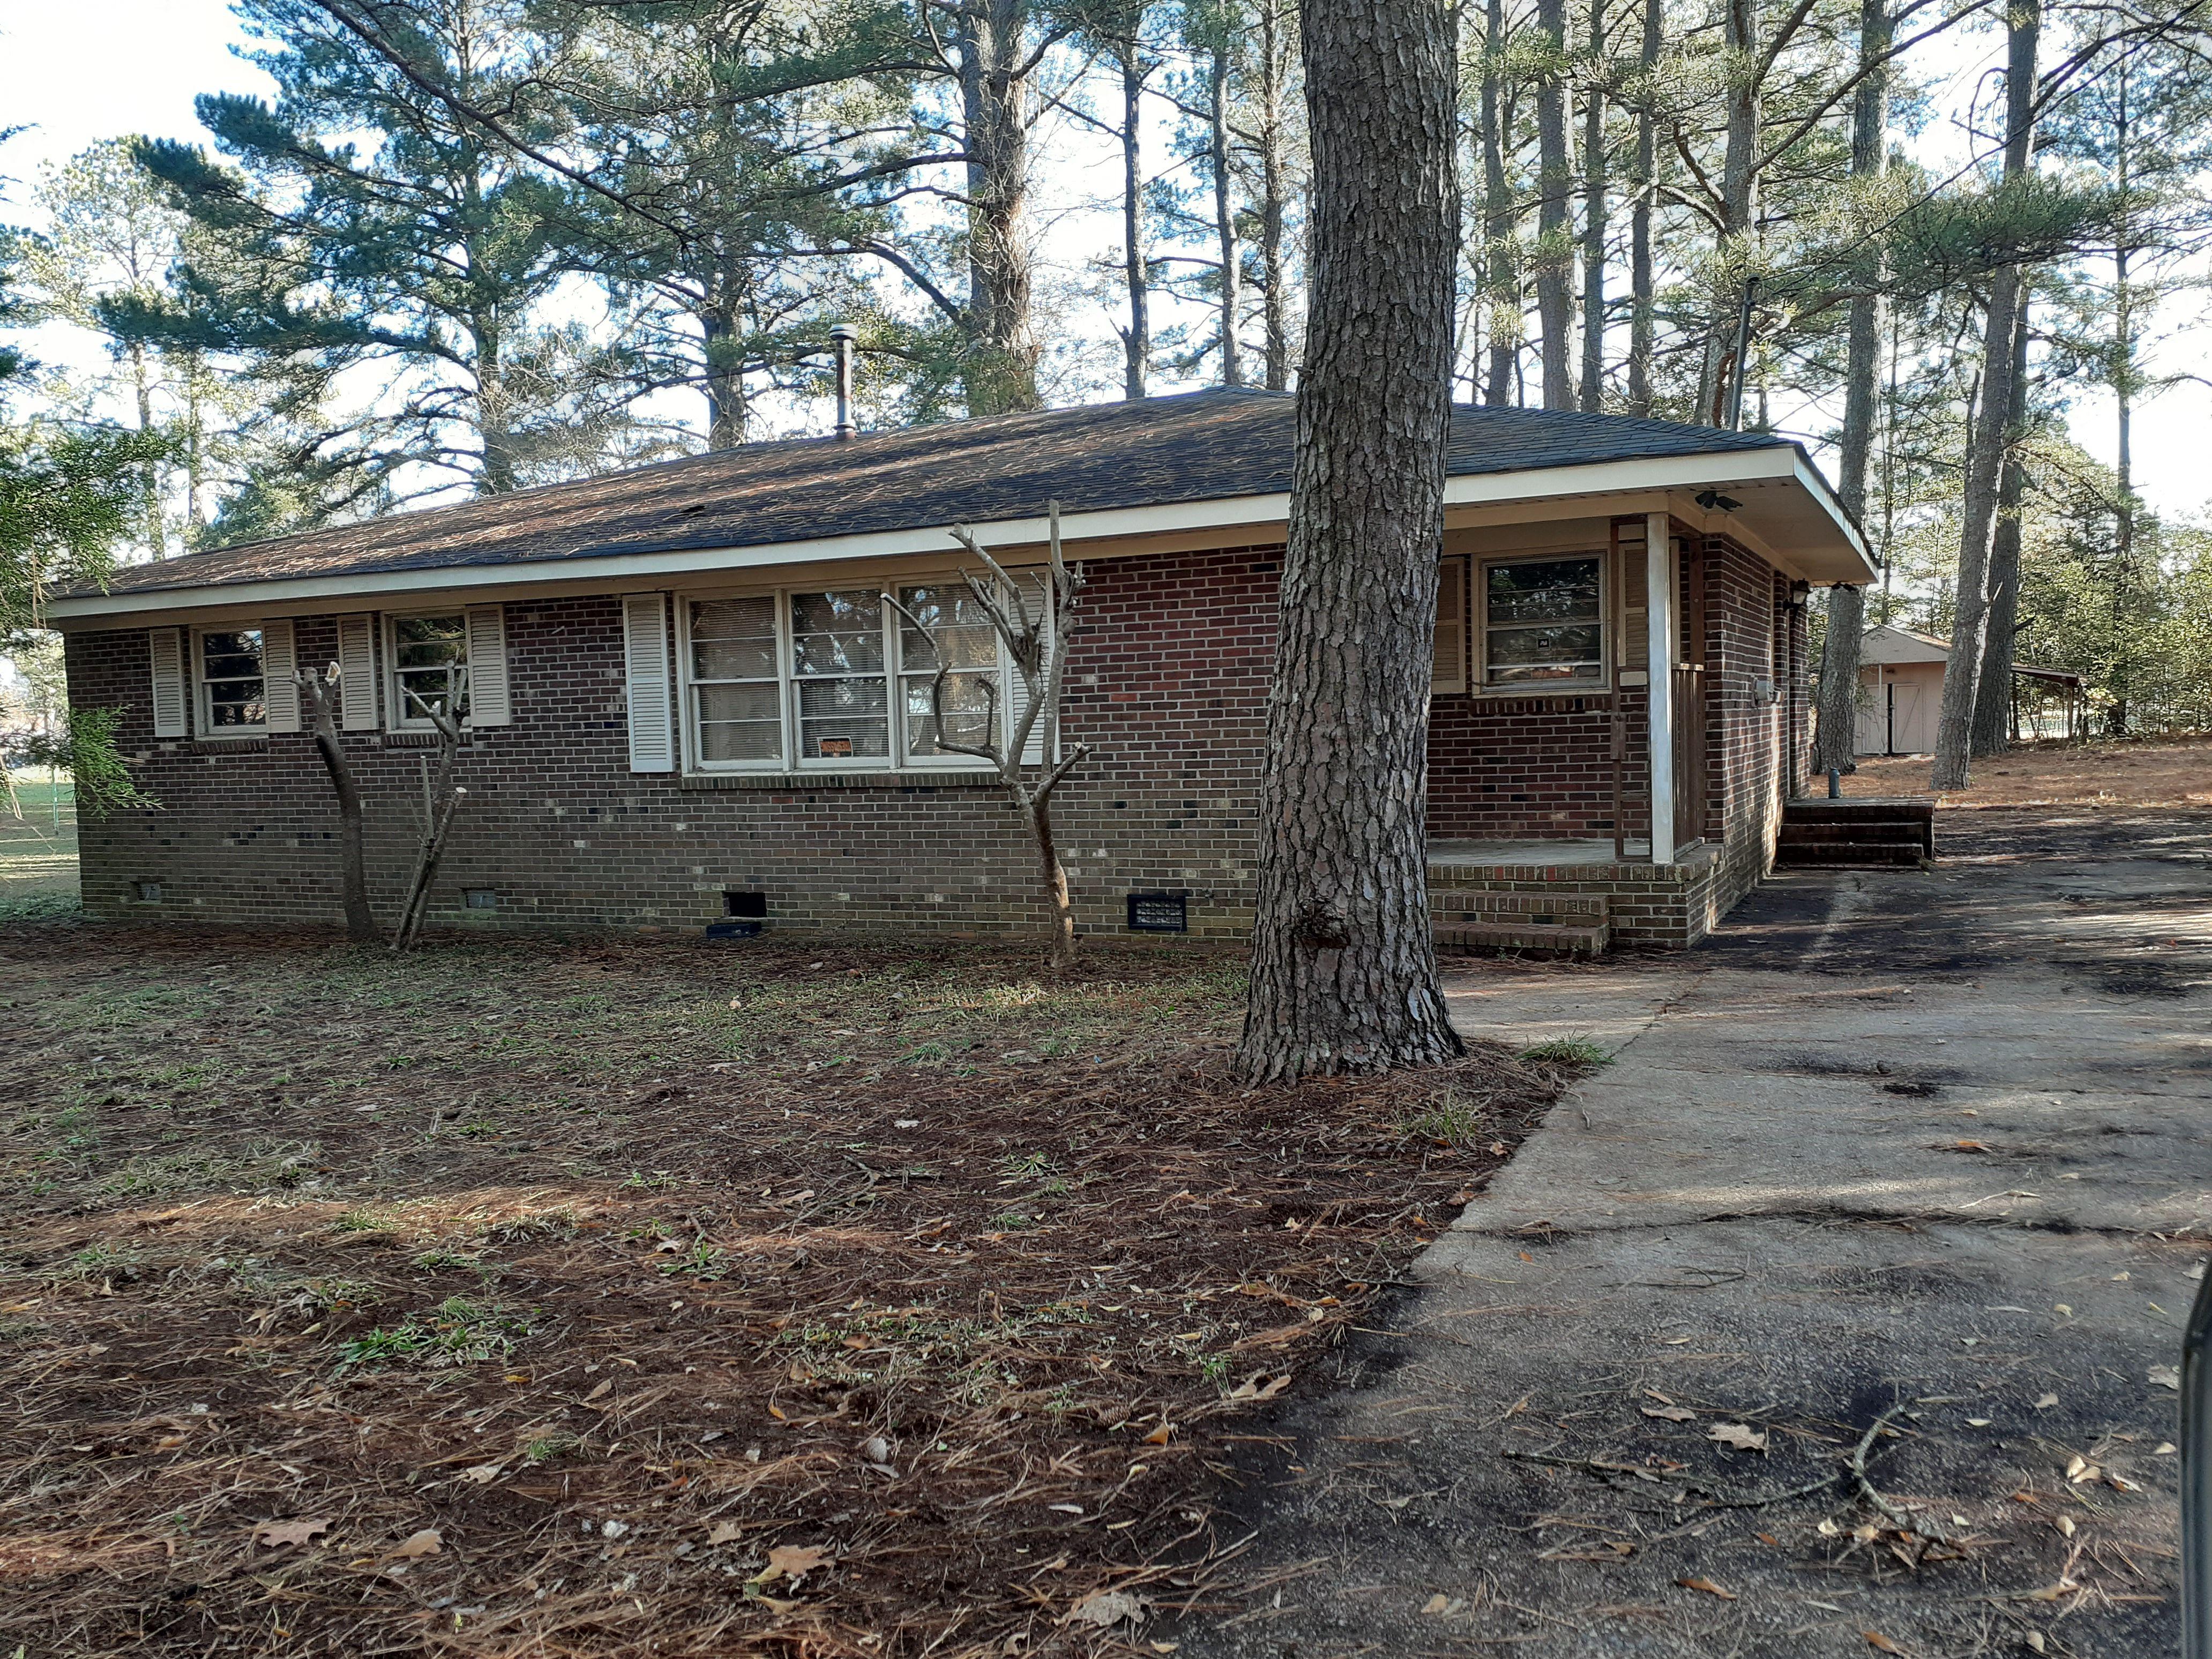 1715 Whitfield Ave, Rocky Mount, NC